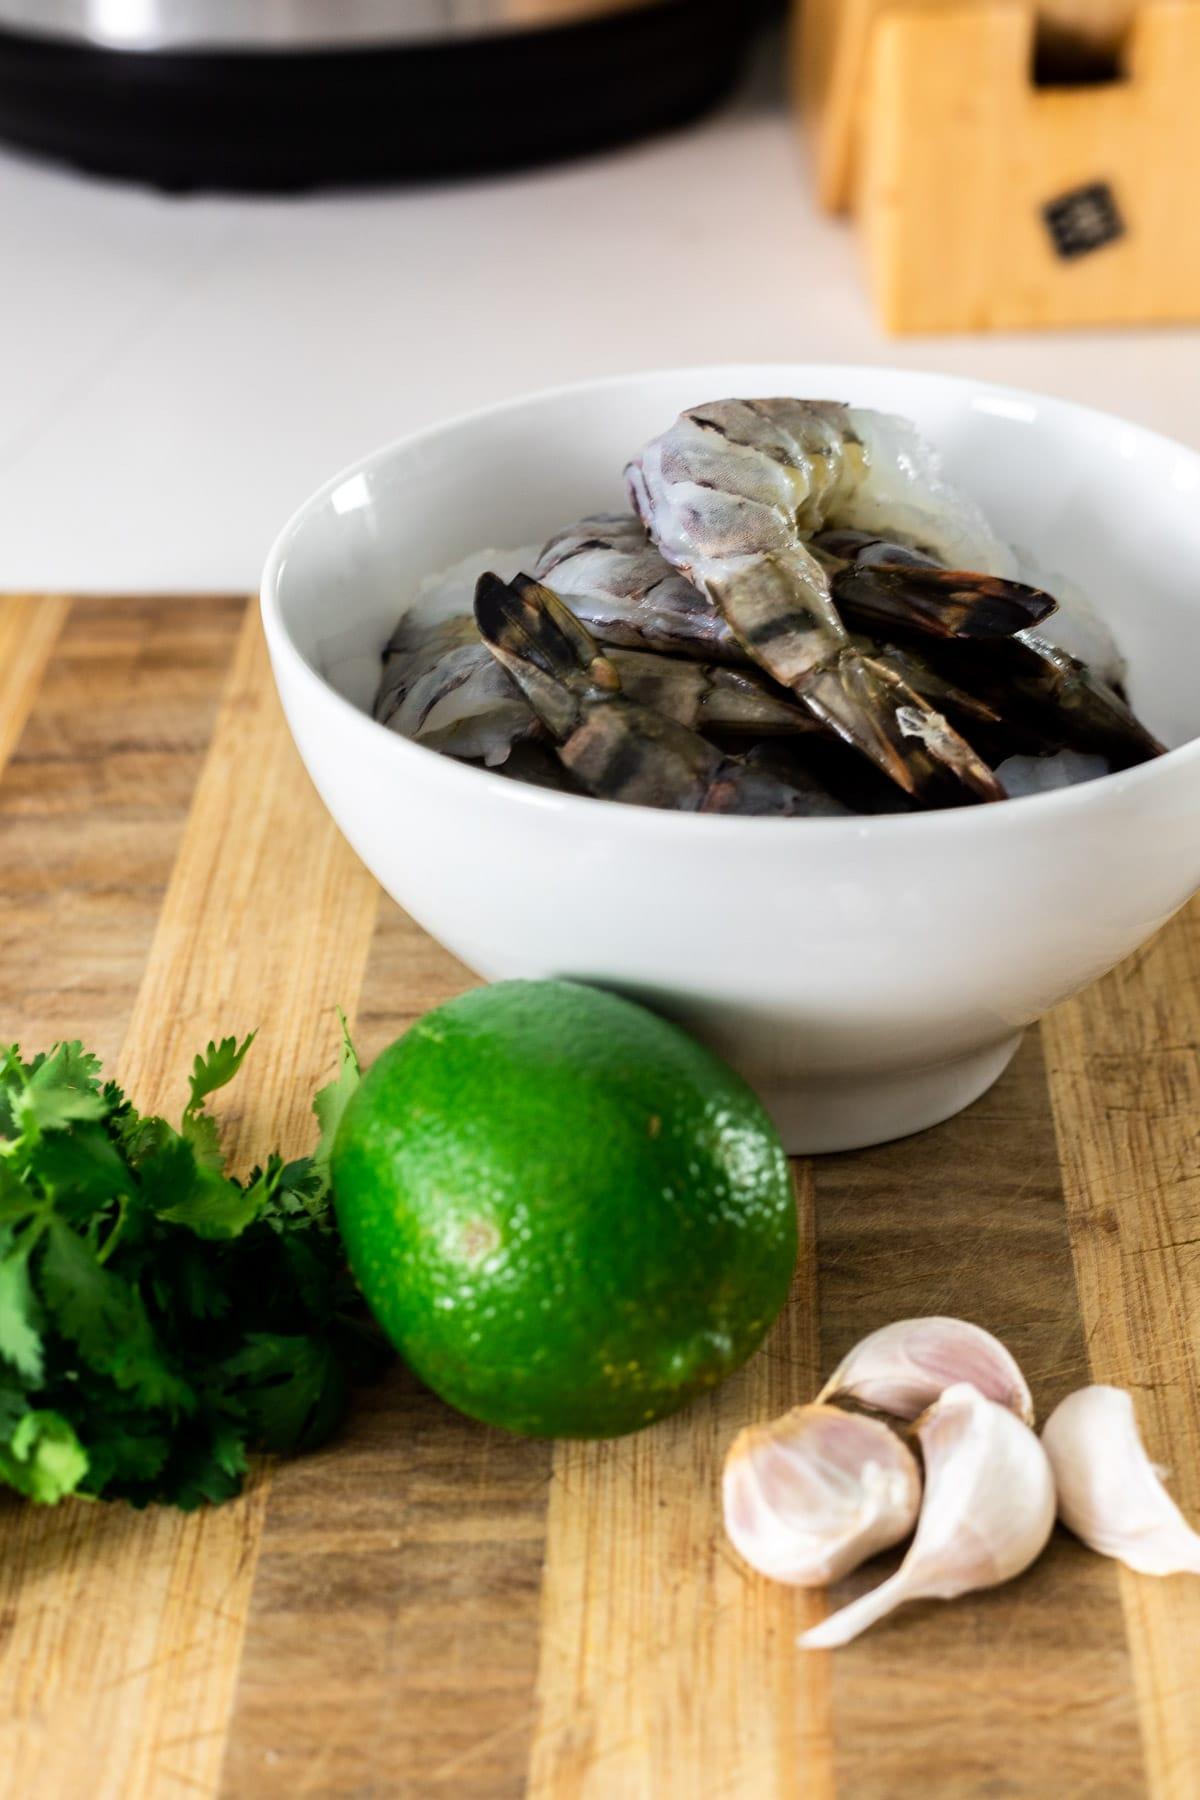 Shrimp, garlic, cilantro and lime on a cutting board.